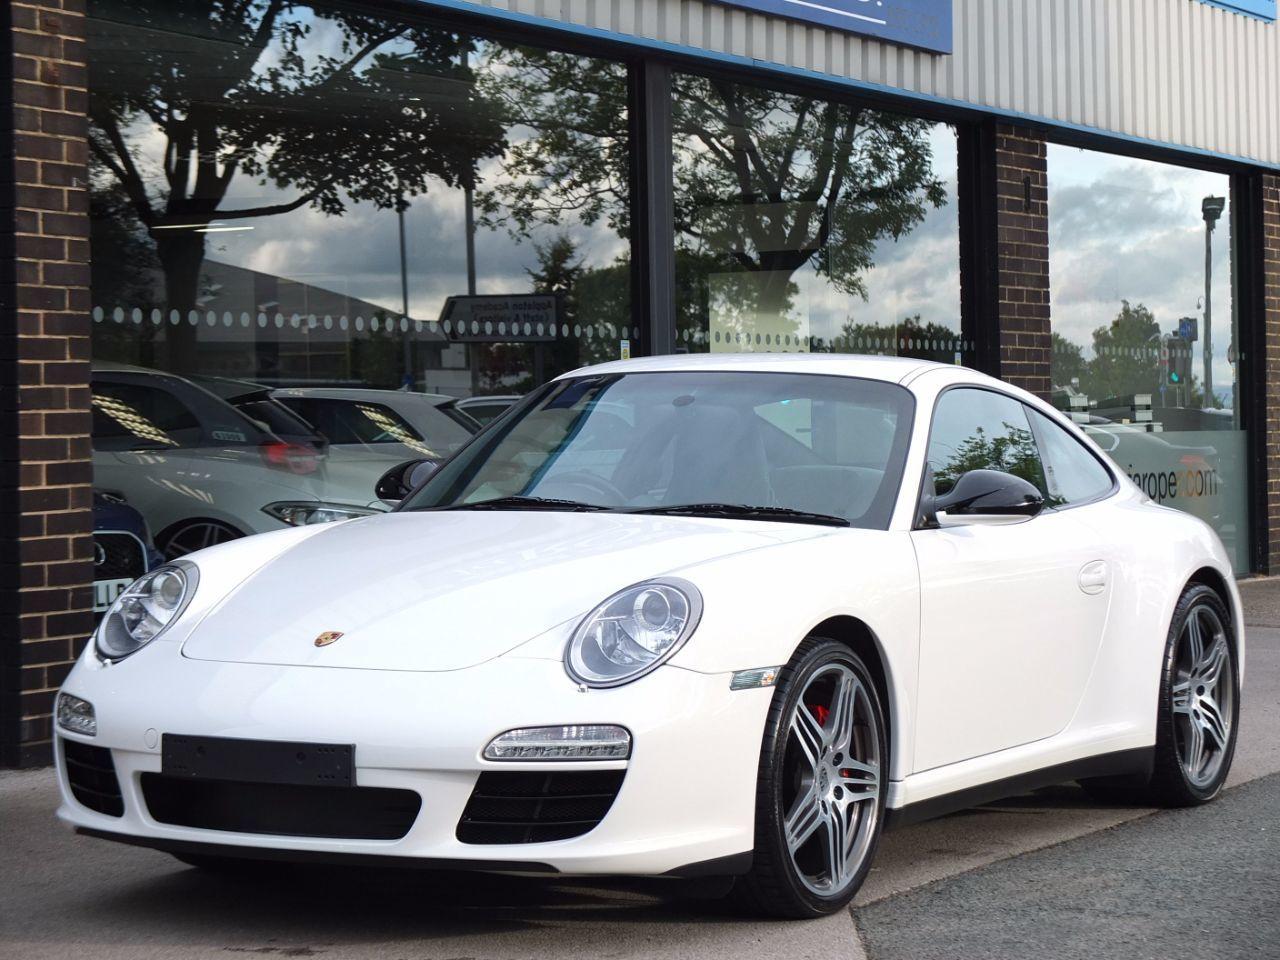 Porsche 911 3.8 997 Carrera 4S PDK Gen II Coupe Petrol Carrara WhitePorsche  911 3.8 997